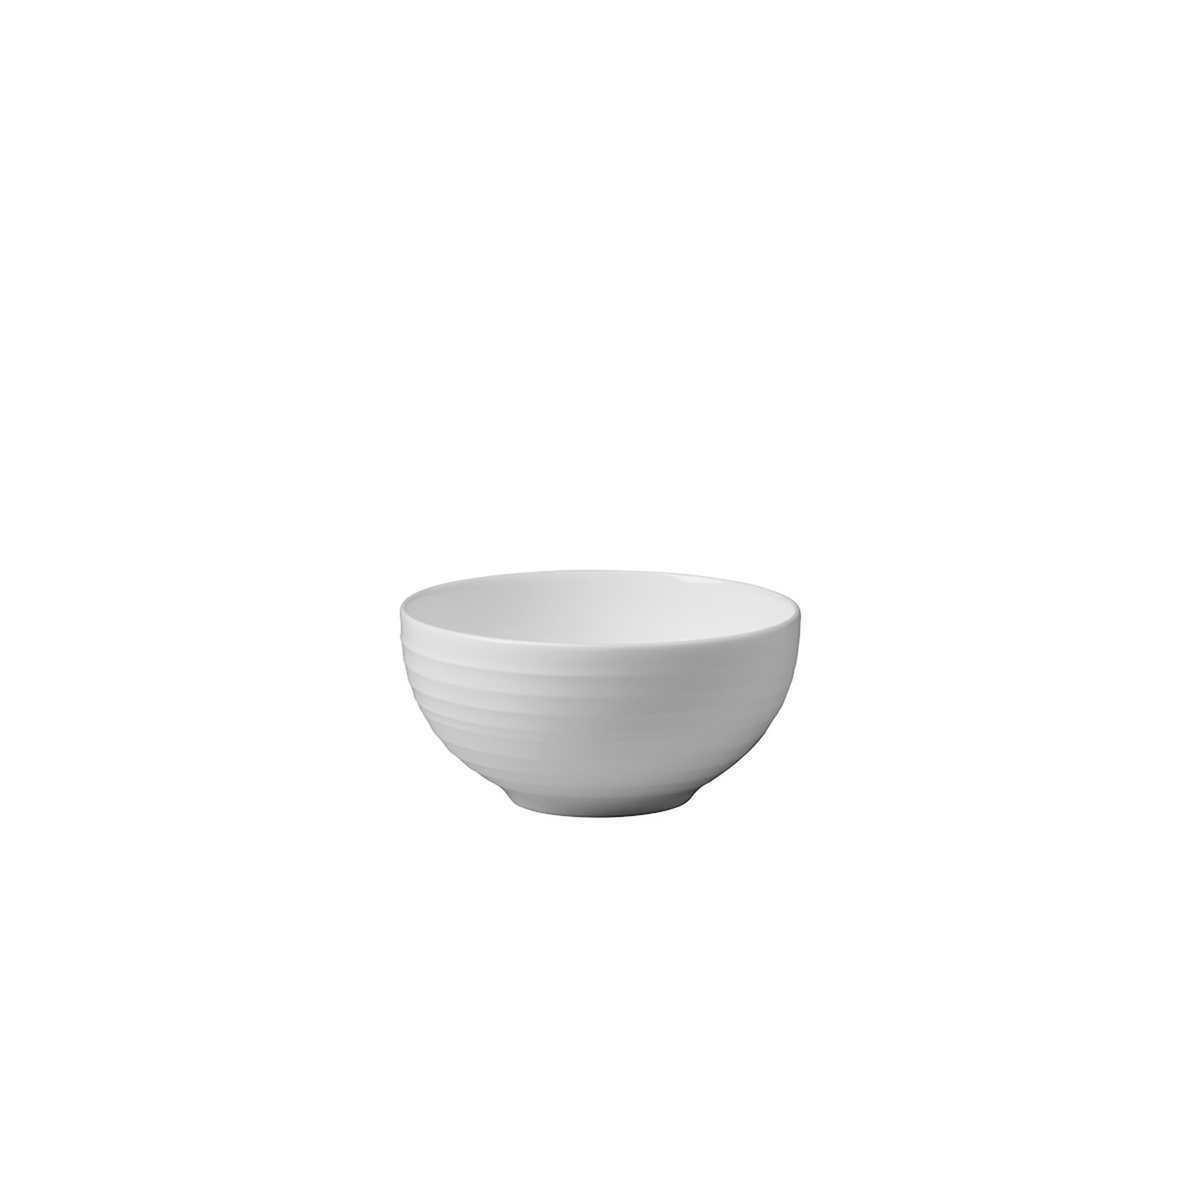 Mikasa Dinnerware Bone China Services 6 Plates Bowls